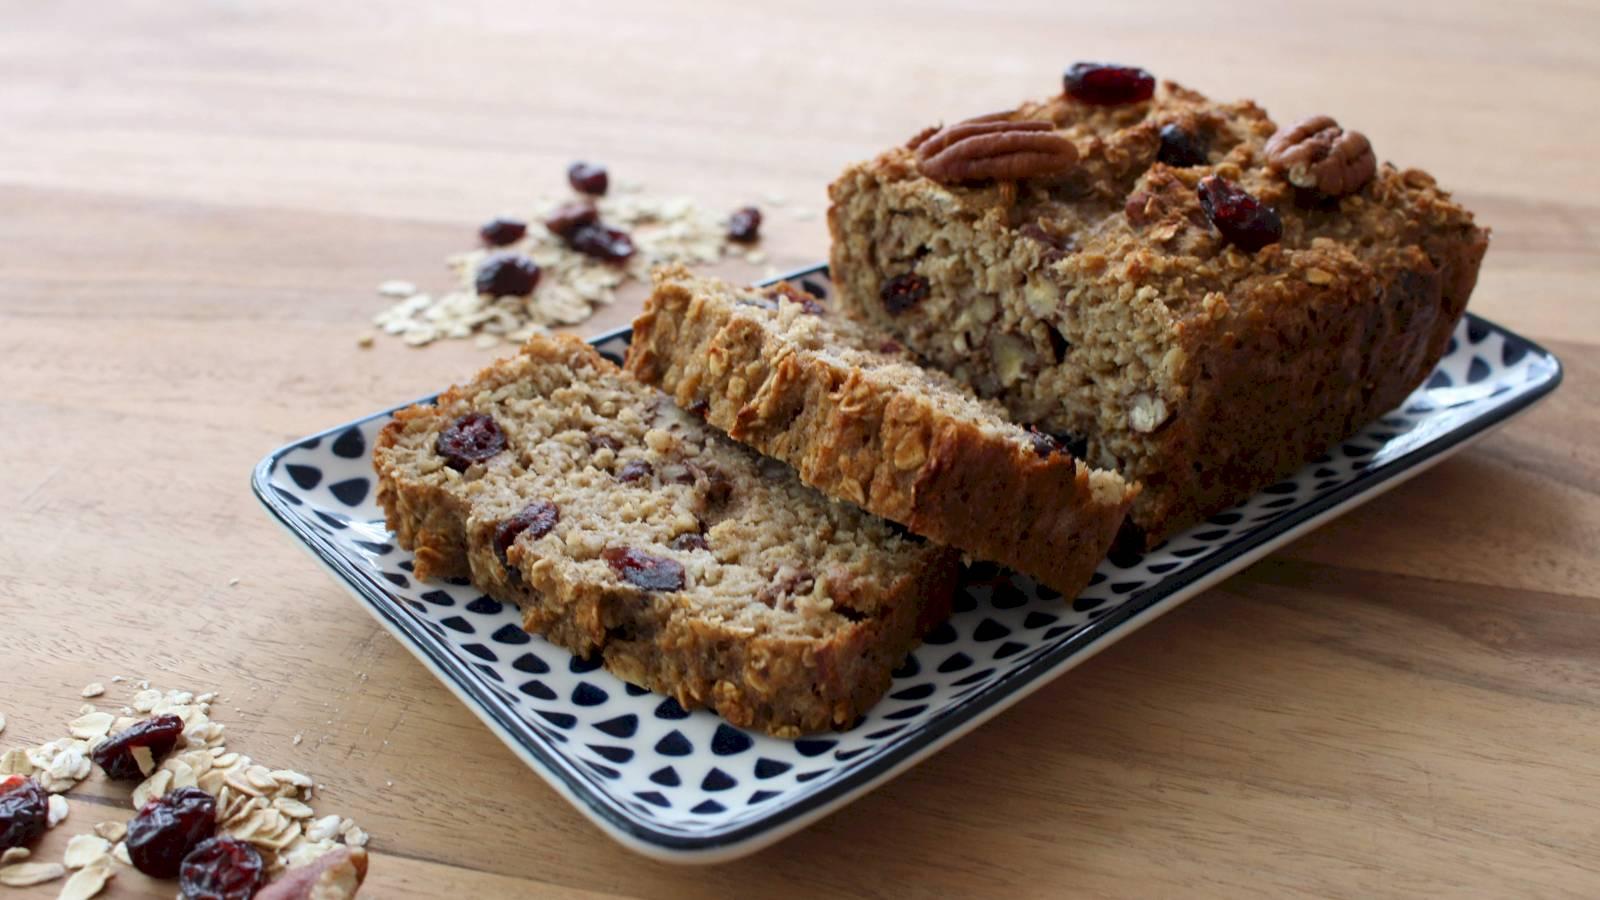 Lekker en gezond recept: havermoutcake met cranberrys